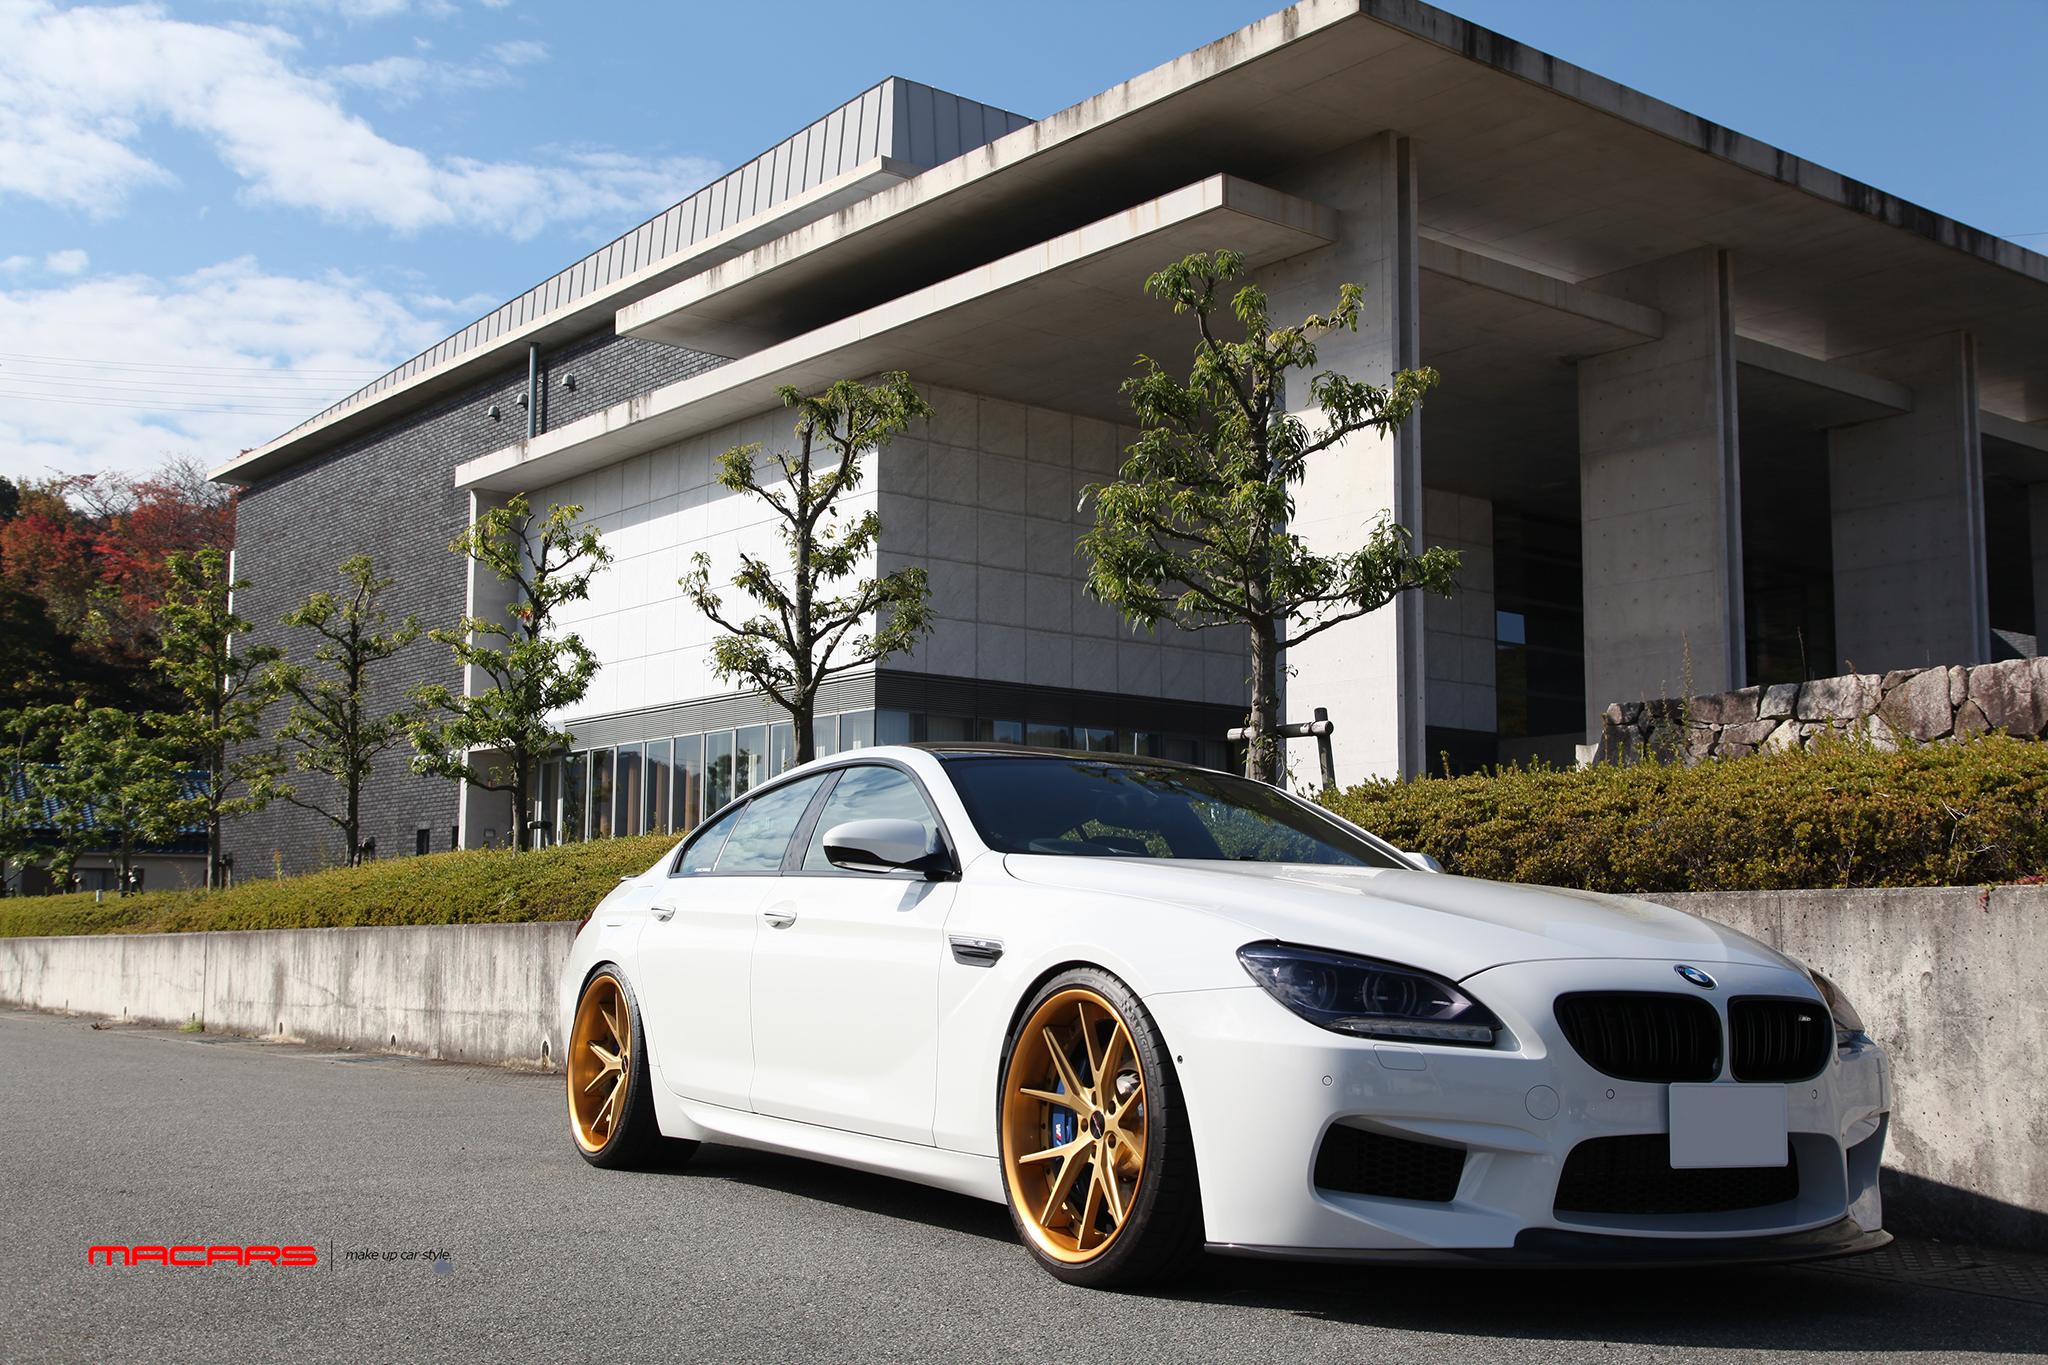 BMW M6/F06 GranCoupe